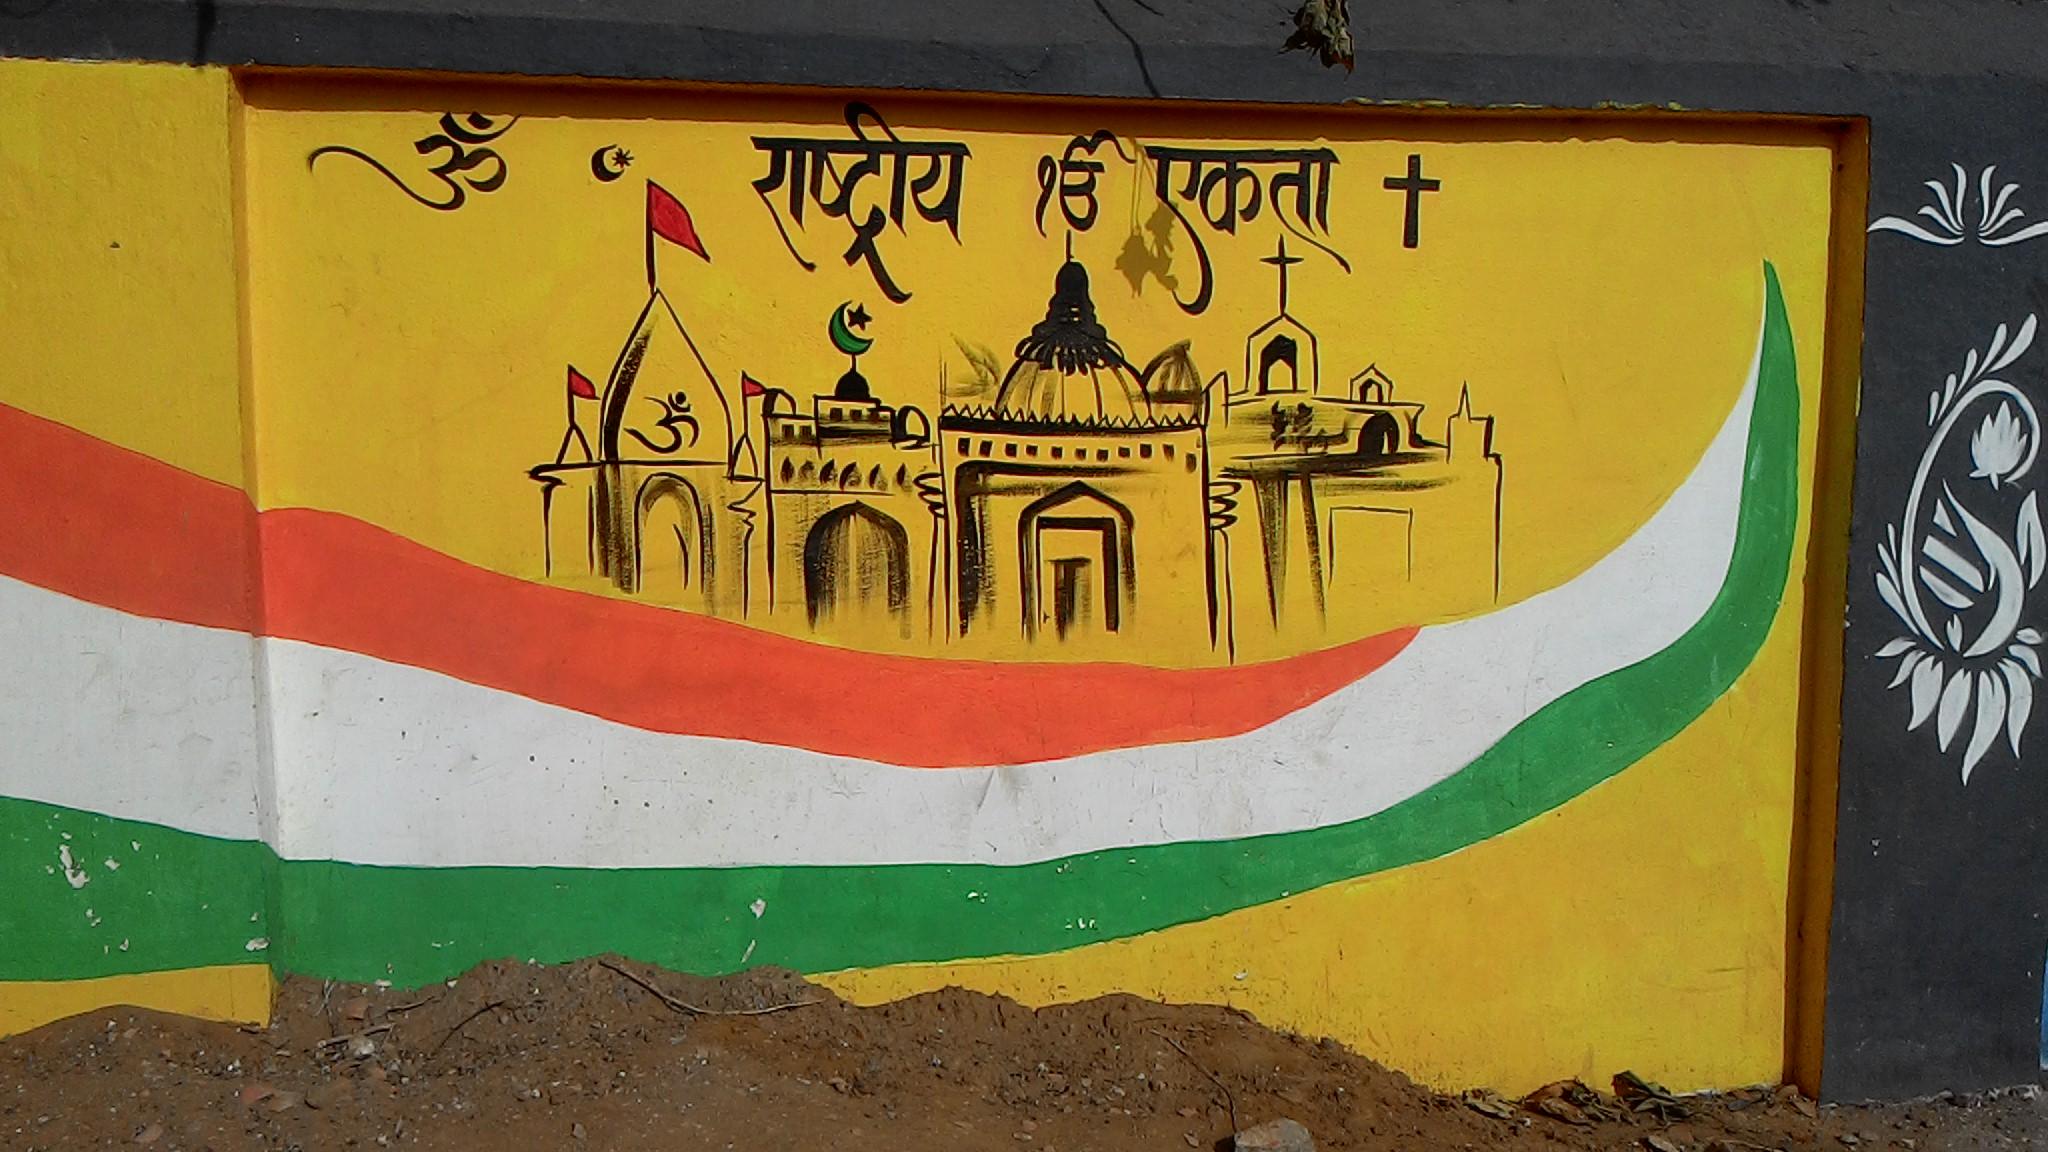 Photoblog : Street Art of Gorakhpur | PENDOWN - Travel, Food, Art ...